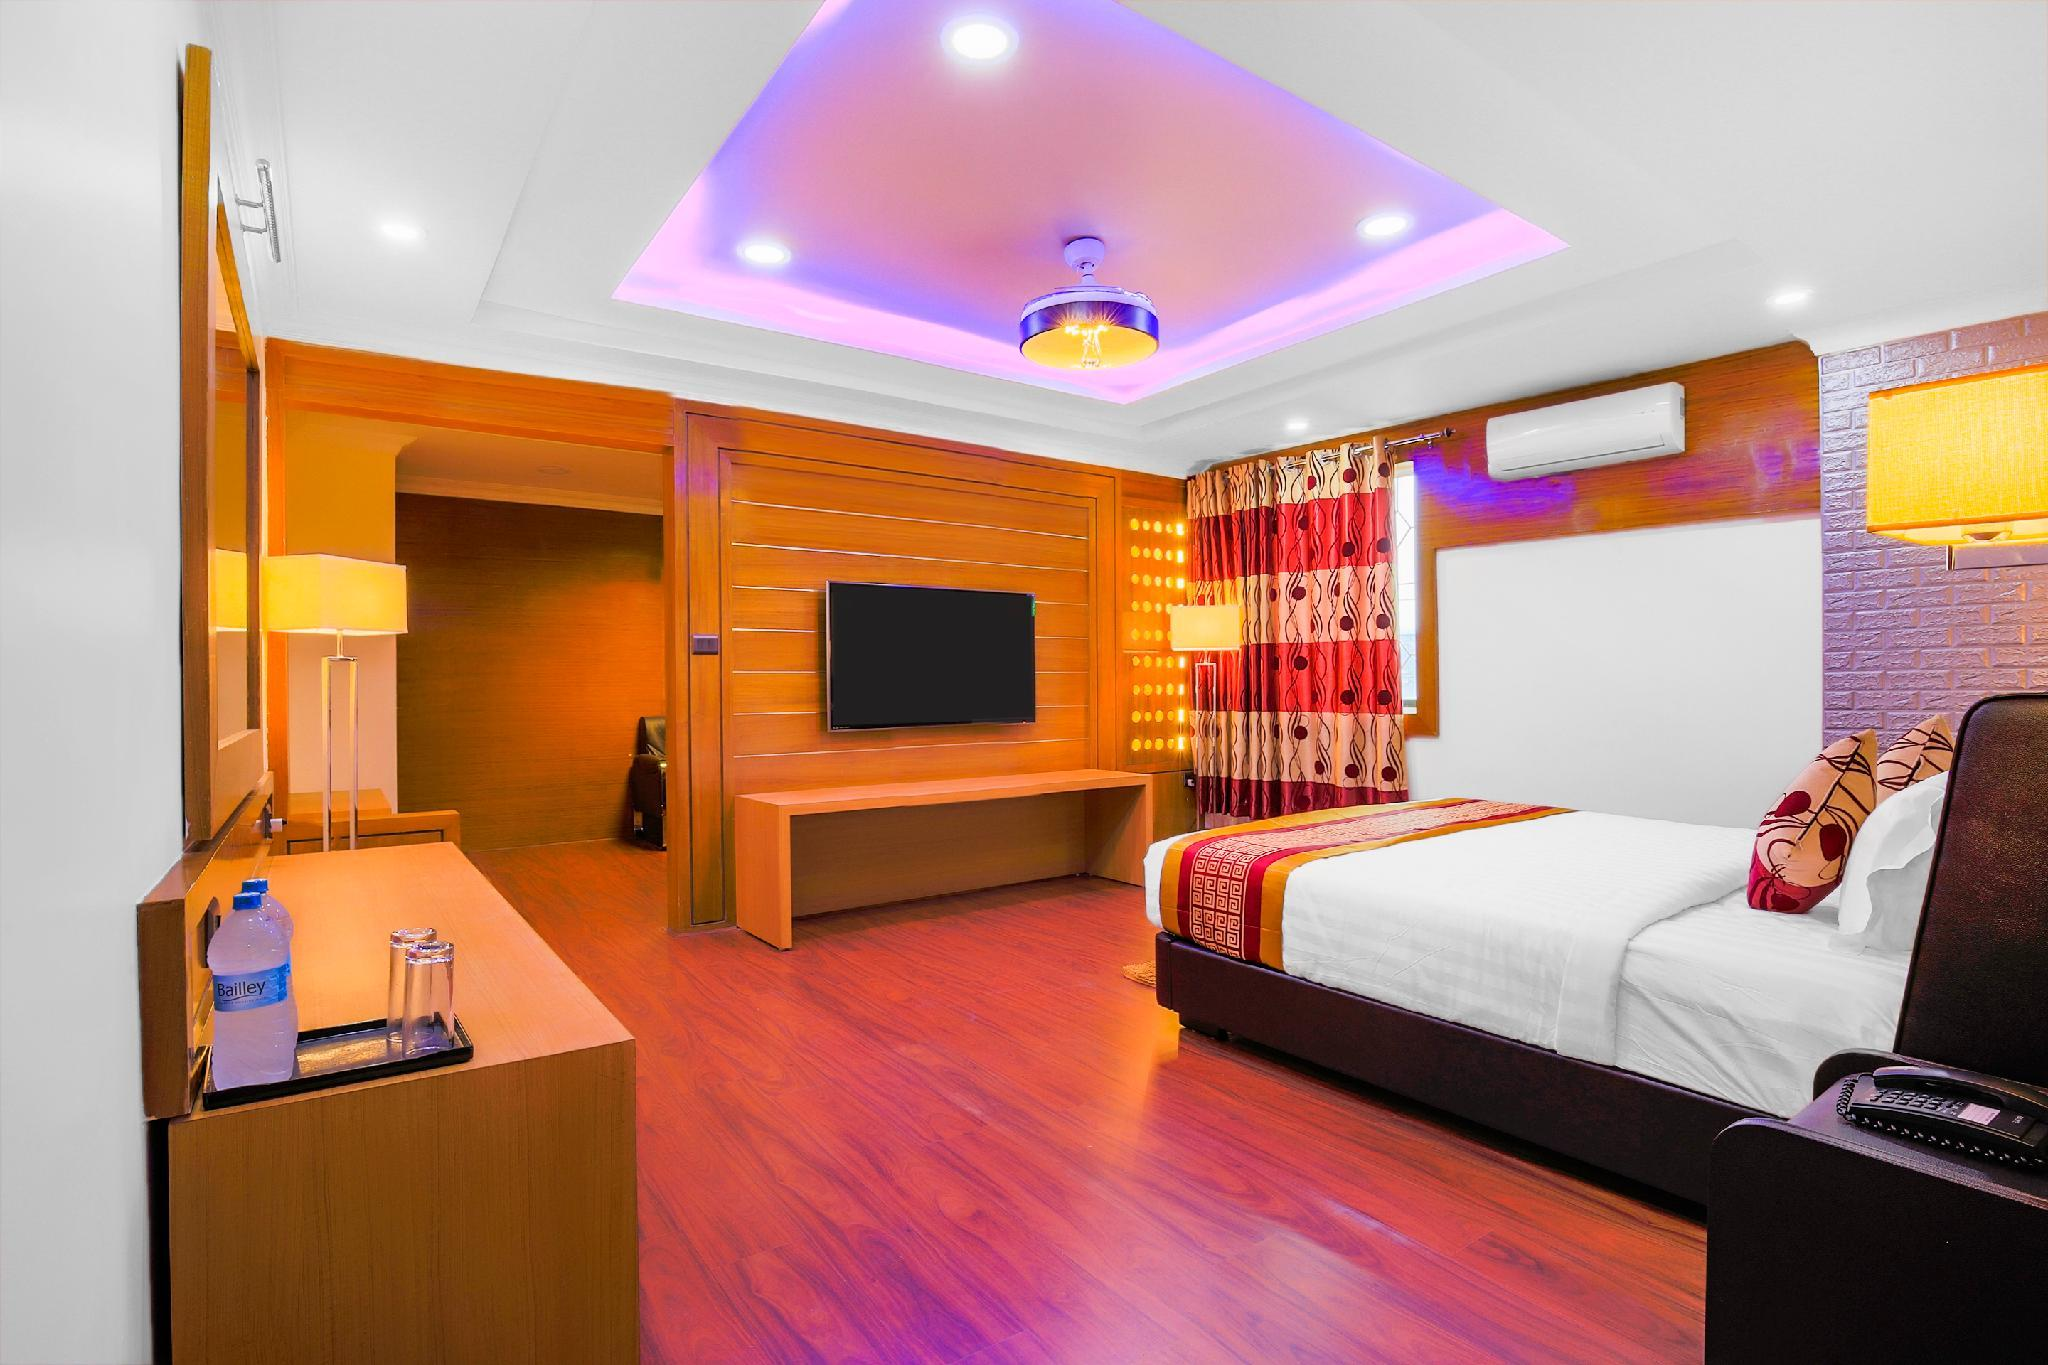 Capital O 435 Hotel Intourist Palace, Koshi